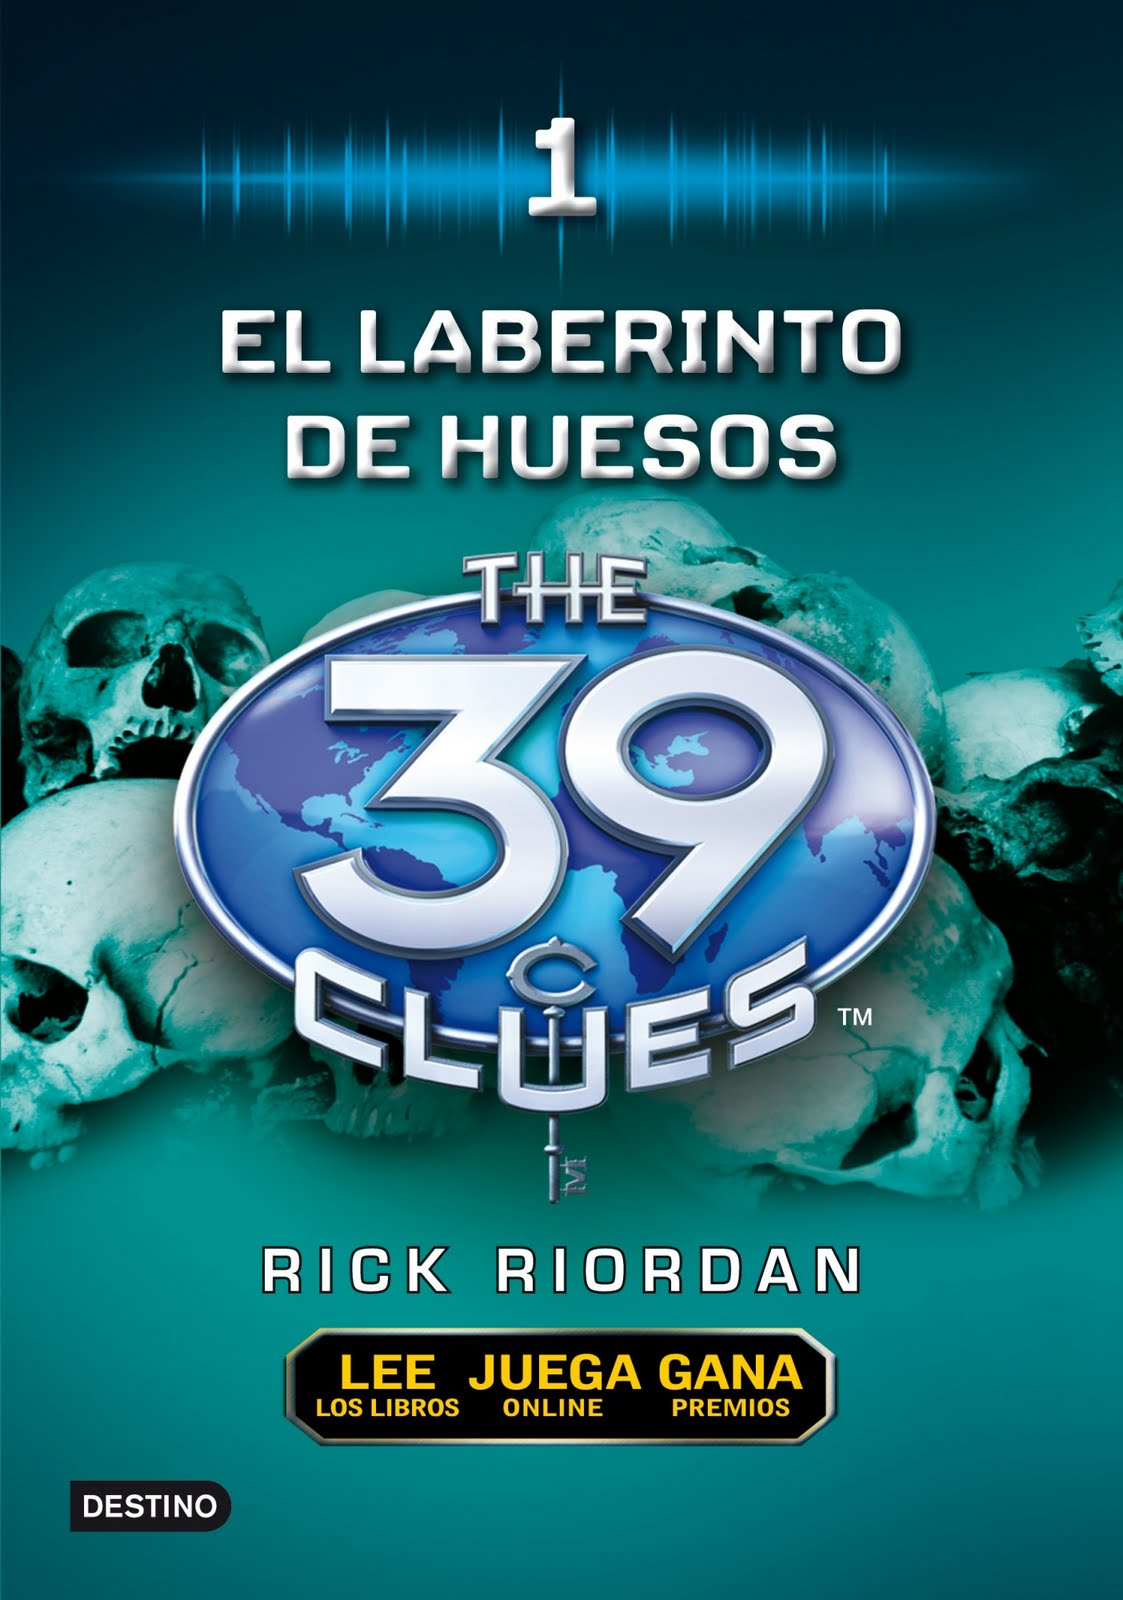 Laberinto De Huesos – Rick Riordan